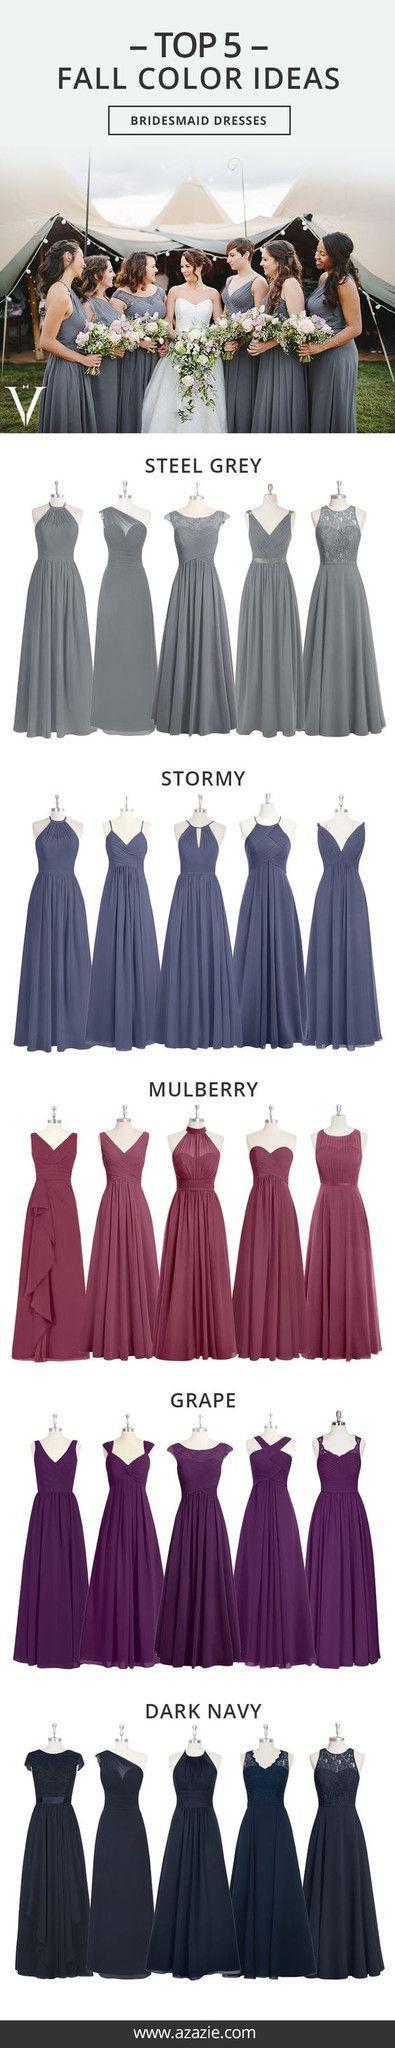 Hochzeit - Top 5 Fall Color Set (5 Shades * 6 Fabrics) - Bridesmaid Dress, Wedding, Wedding Gown, Grape, Stormy, Mulberry, Steel Grey, Dark Navy Chiffon, Mesh, Lace